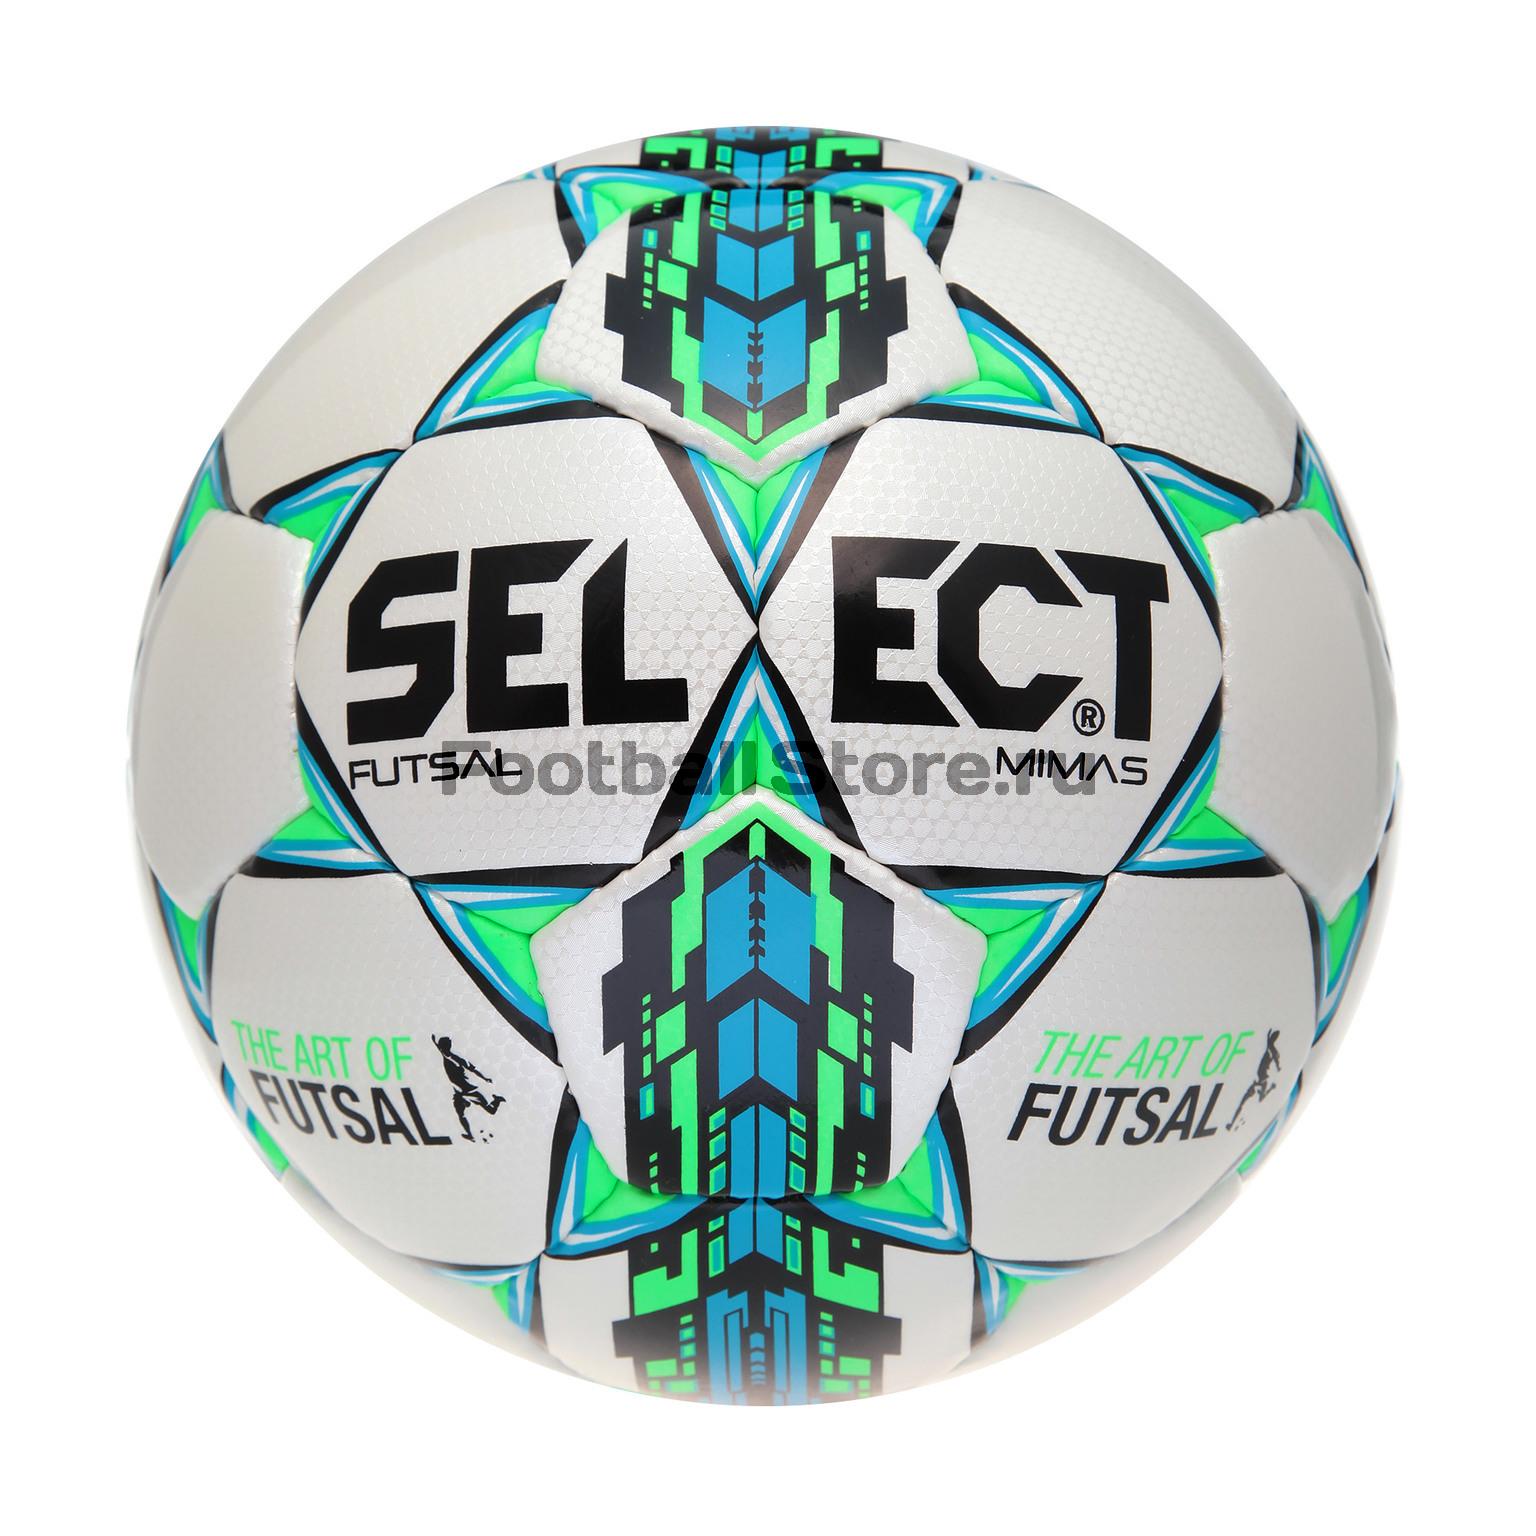 Мяч Select Futsal MIMAS 852608-002 мяч футзальный select futsal talento 11 852616 049 р 3